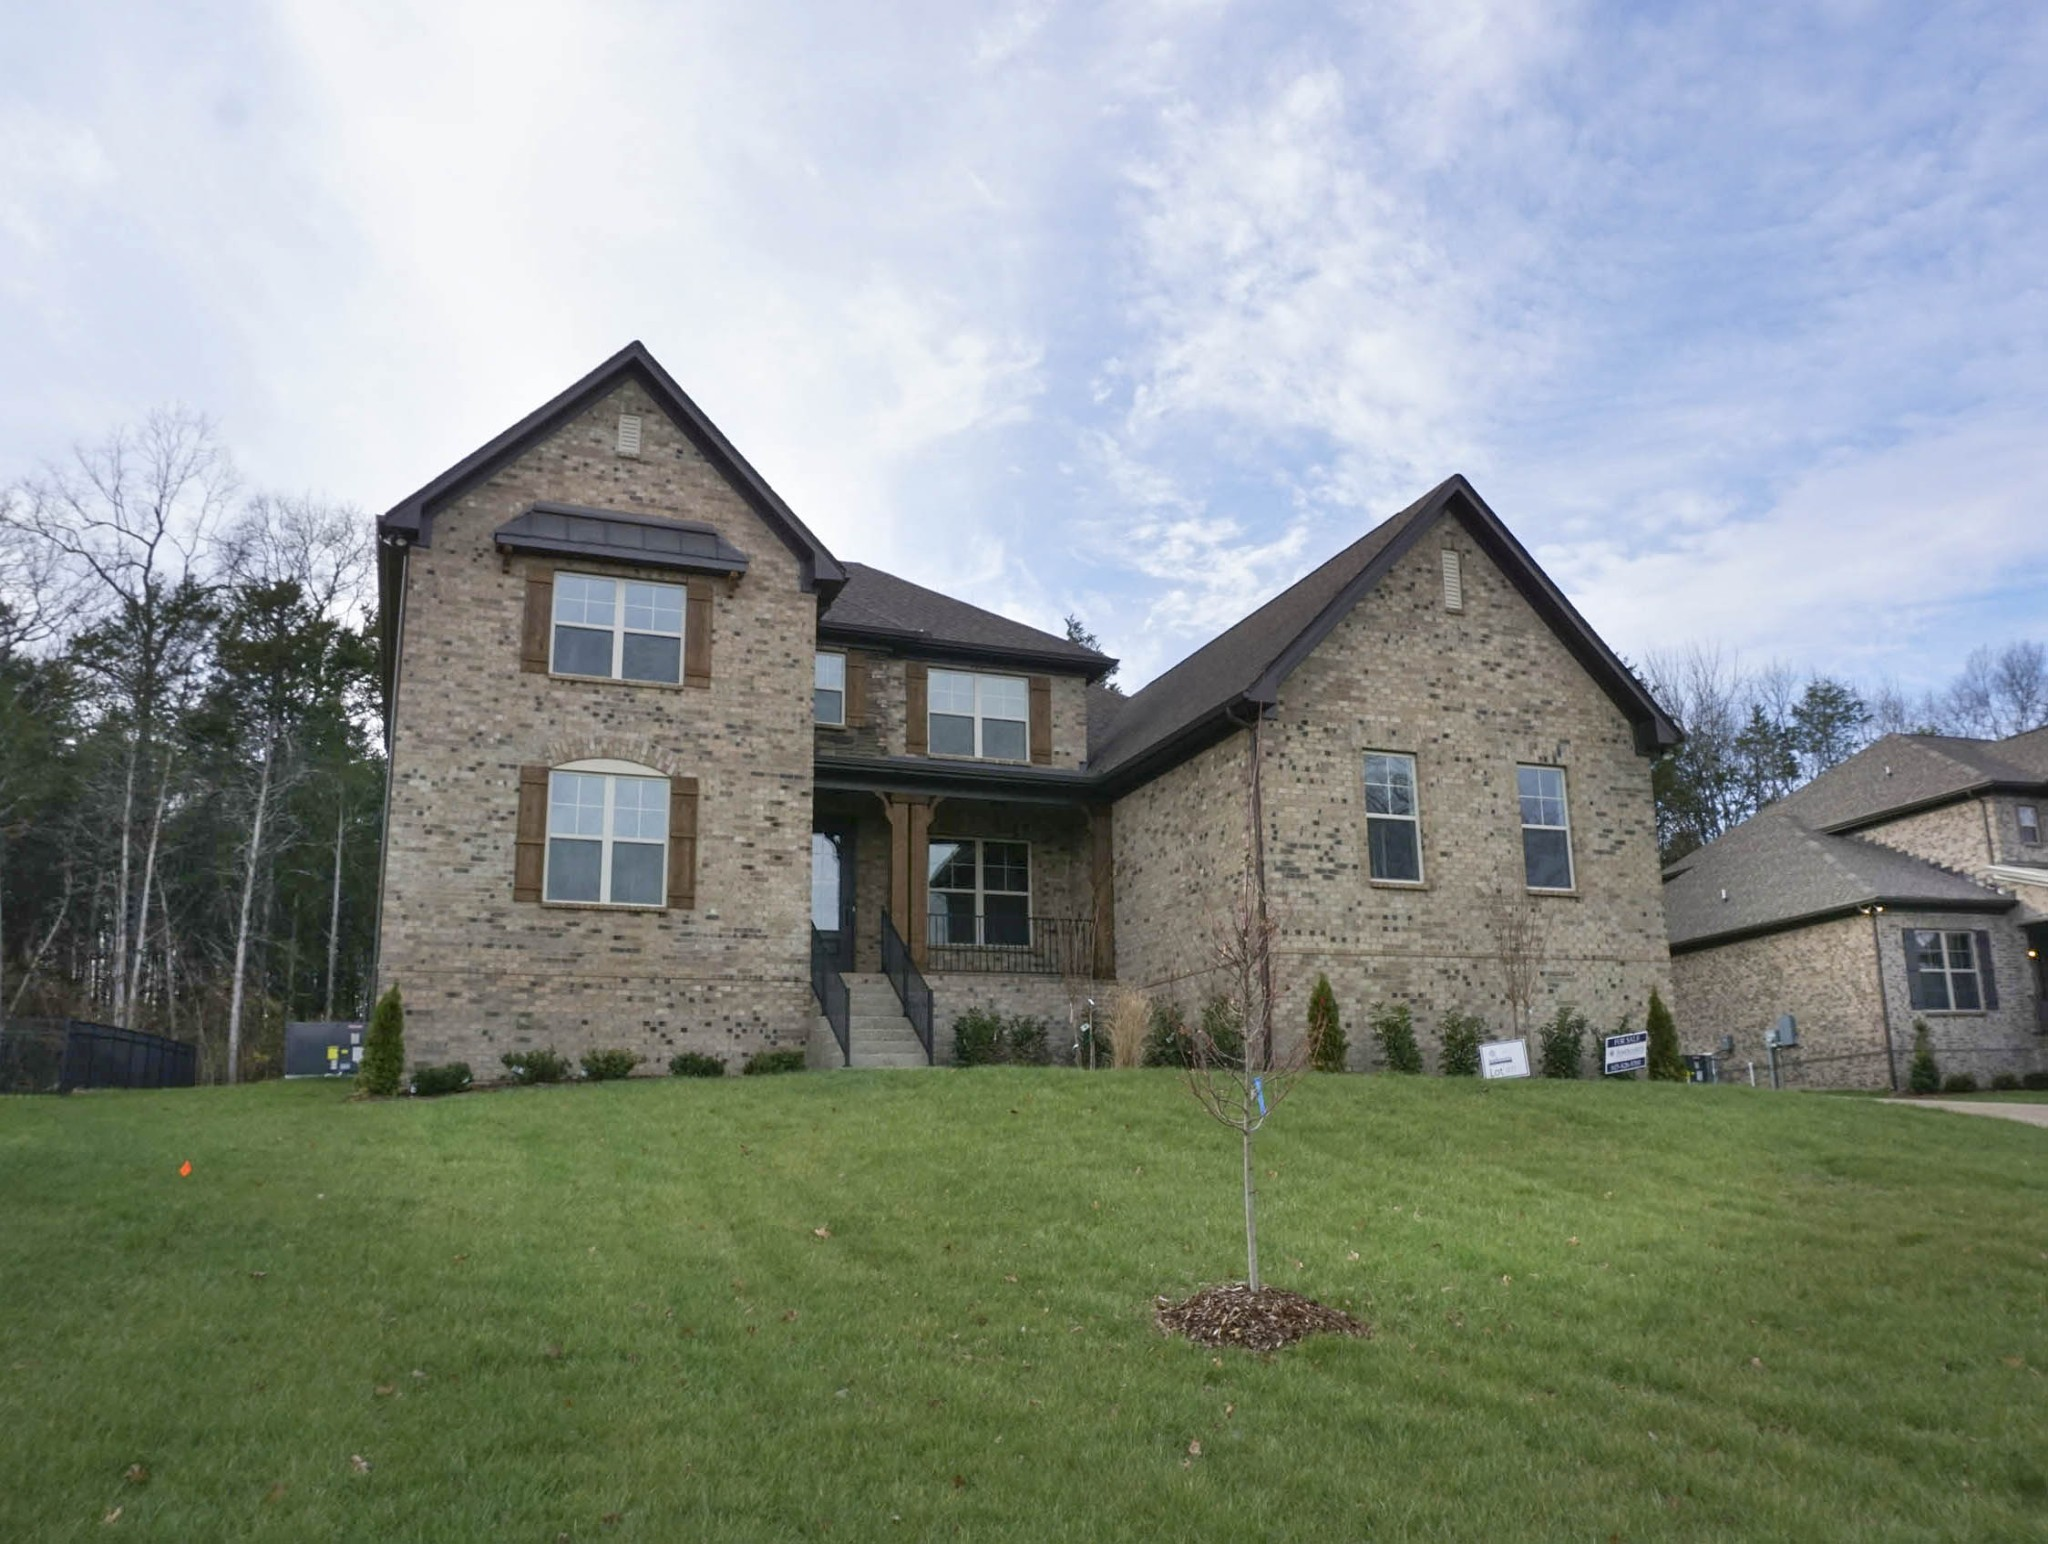 119 Watermill Lane Lot 120, Lebanon, TN 37087 - Lebanon, TN real estate listing